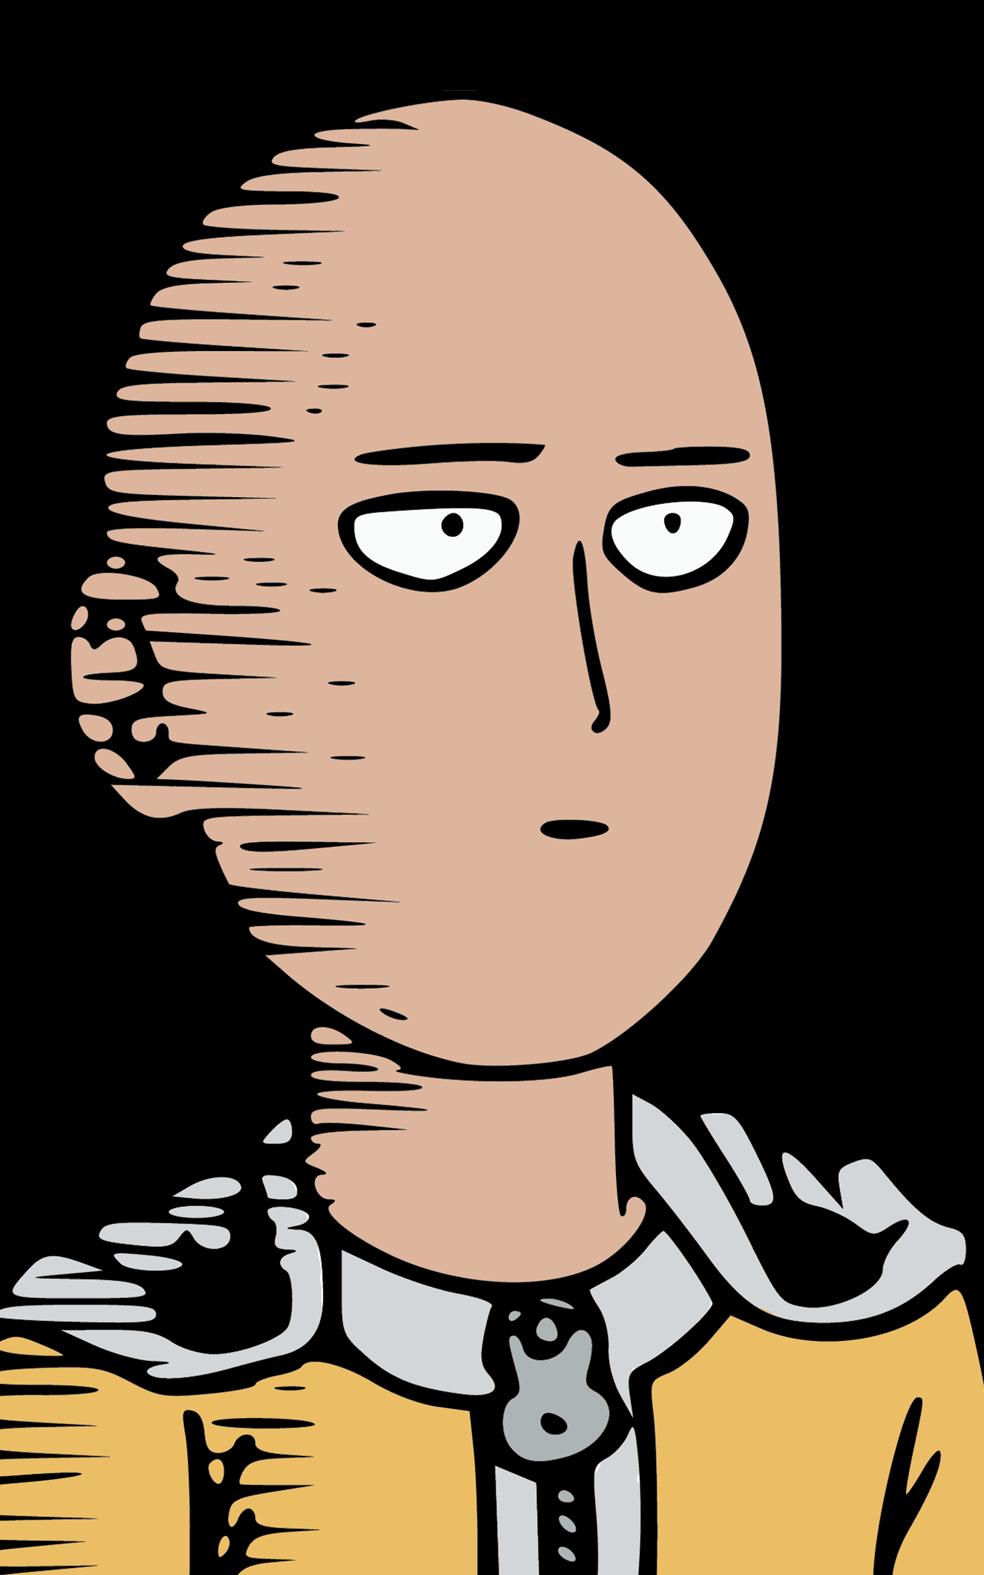 Saitama Americanfootballaesthetic Saitama In 2020 One Punch Man Anime One Punch Man Manga One Punch Man Funny